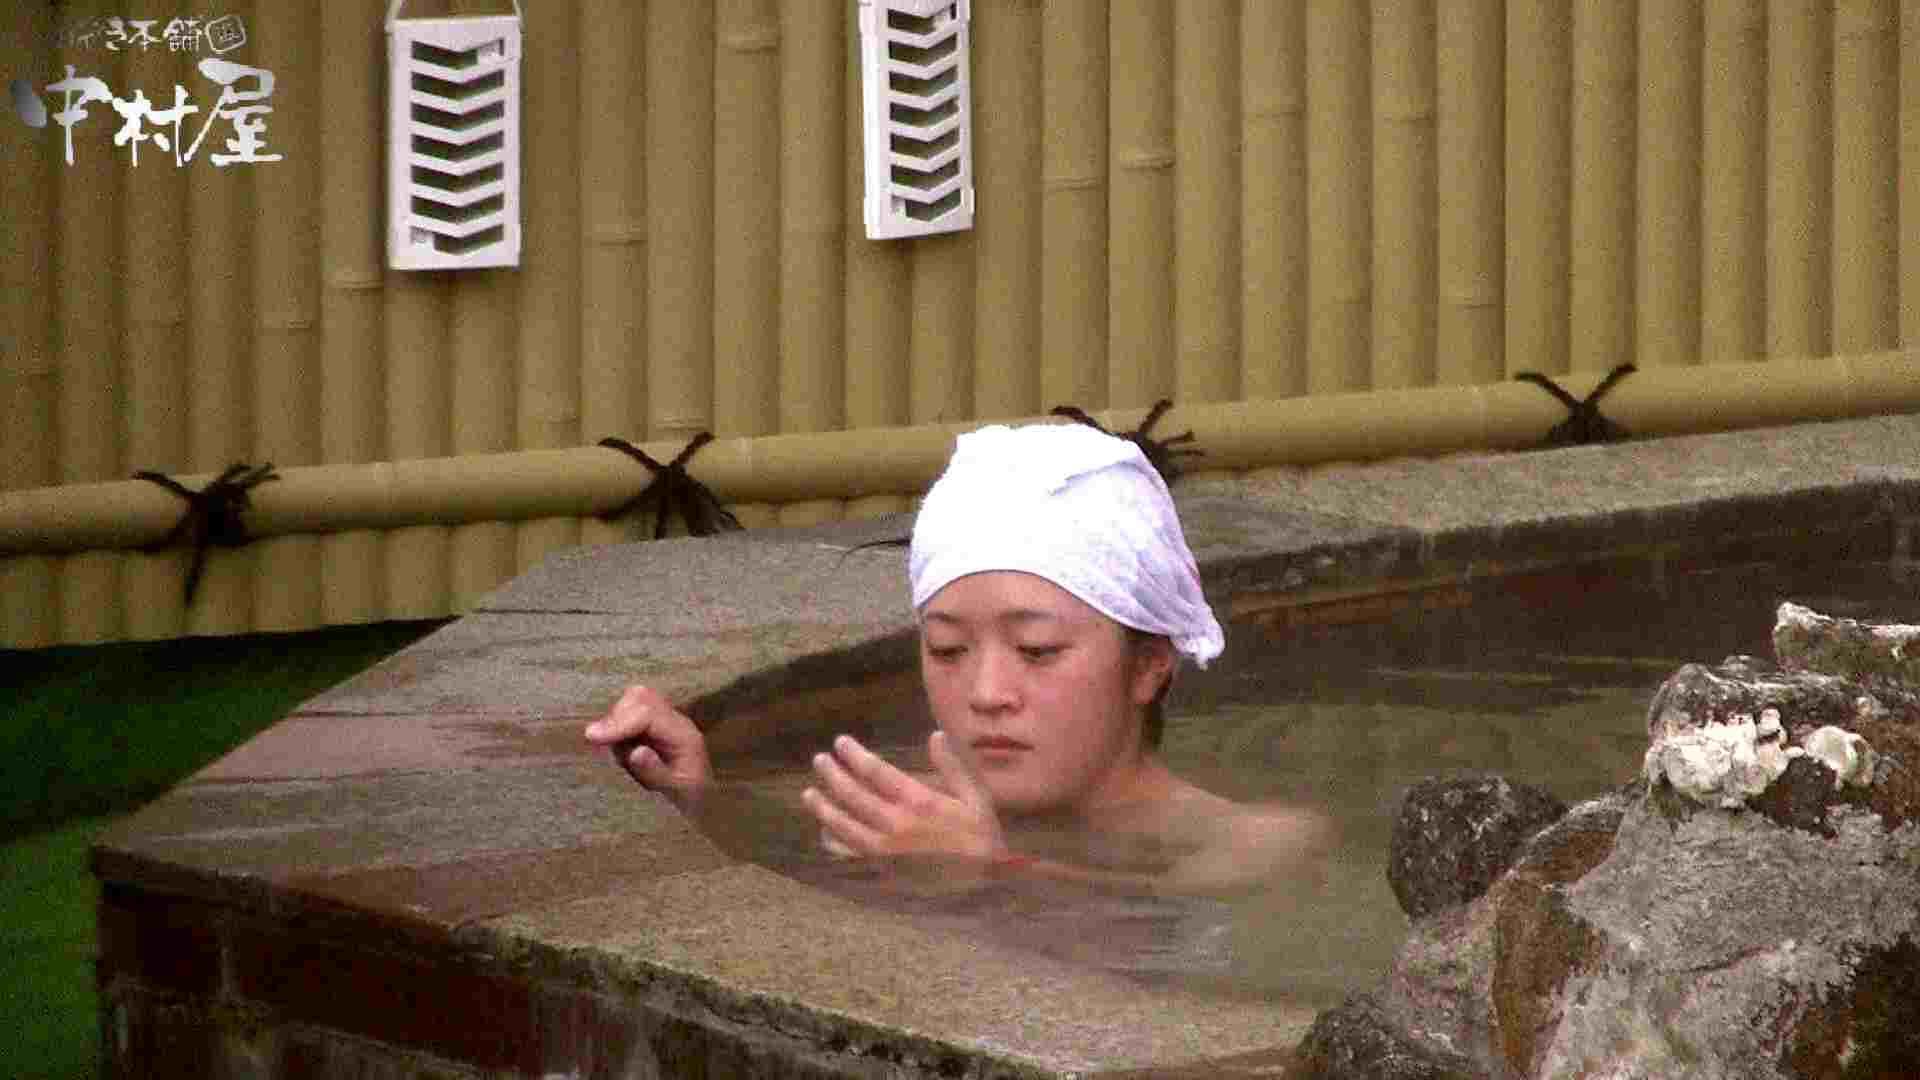 Aquaな露天風呂Vol.920 露天風呂突入 濡れ場動画紹介 69pic 14